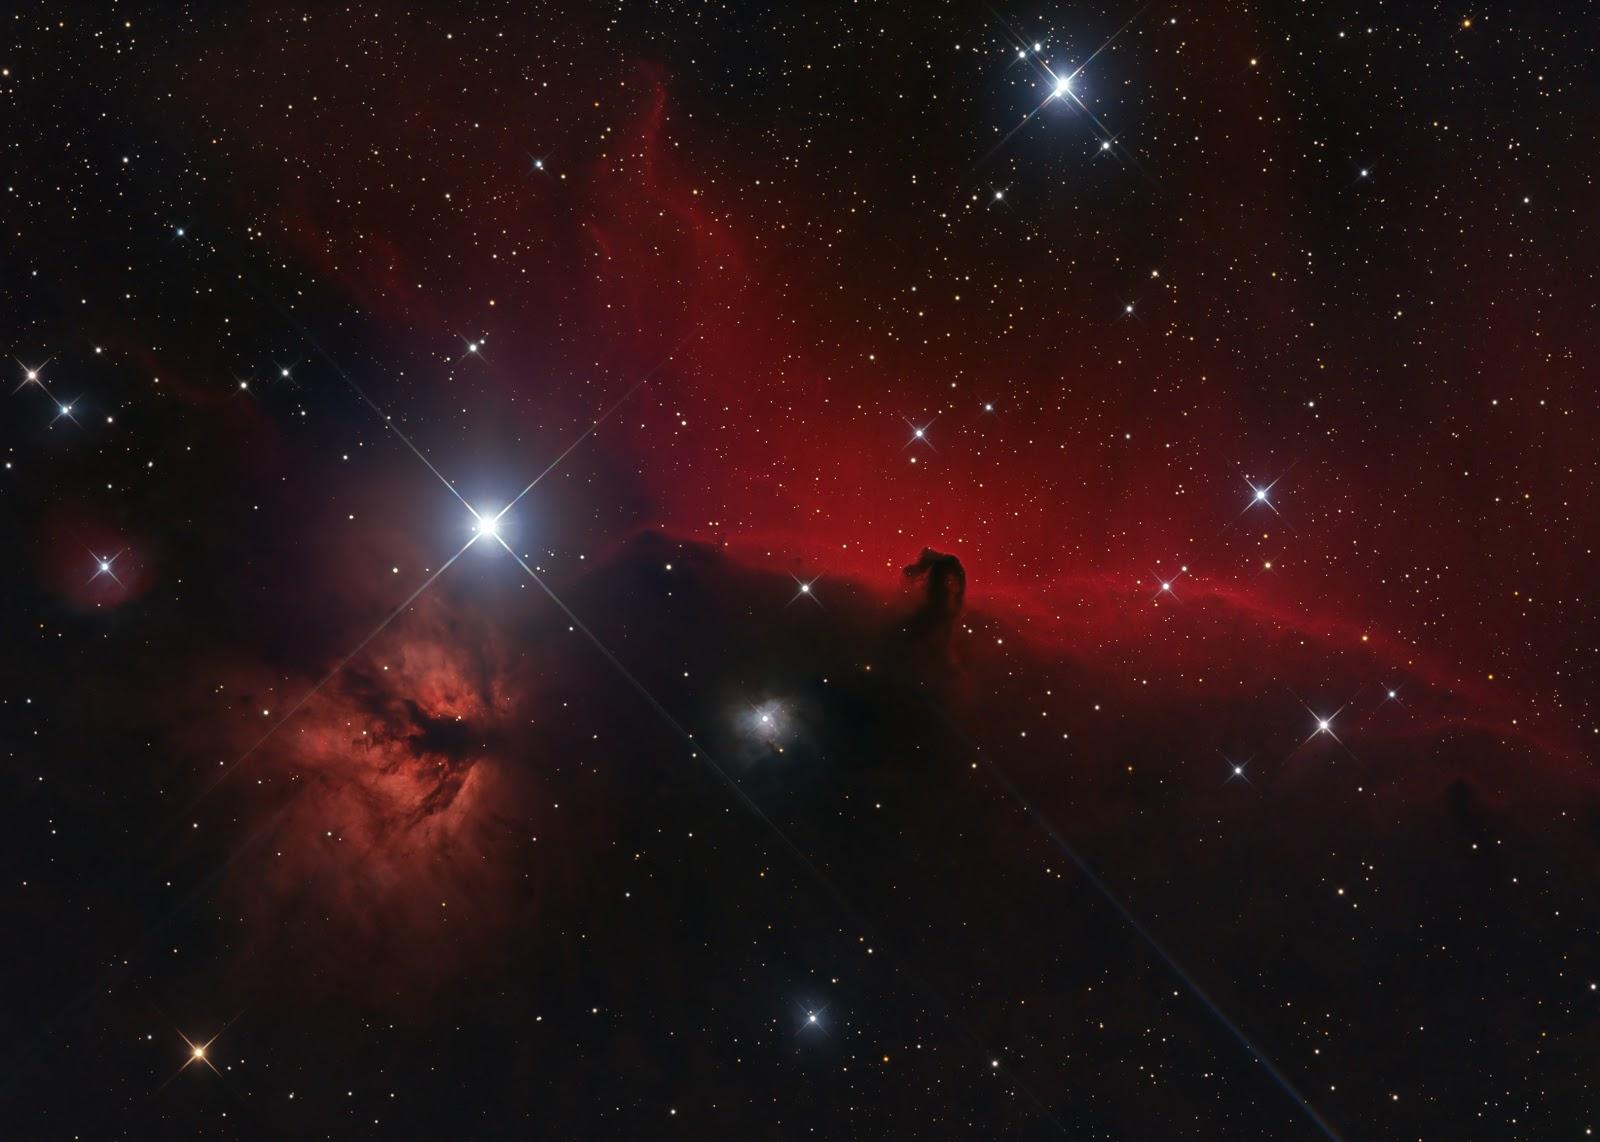 Good   Wallpaper Horse Nebula - Horsehead-Nebula-Wallpaper-HD-05  You Should Have_152118.jpg